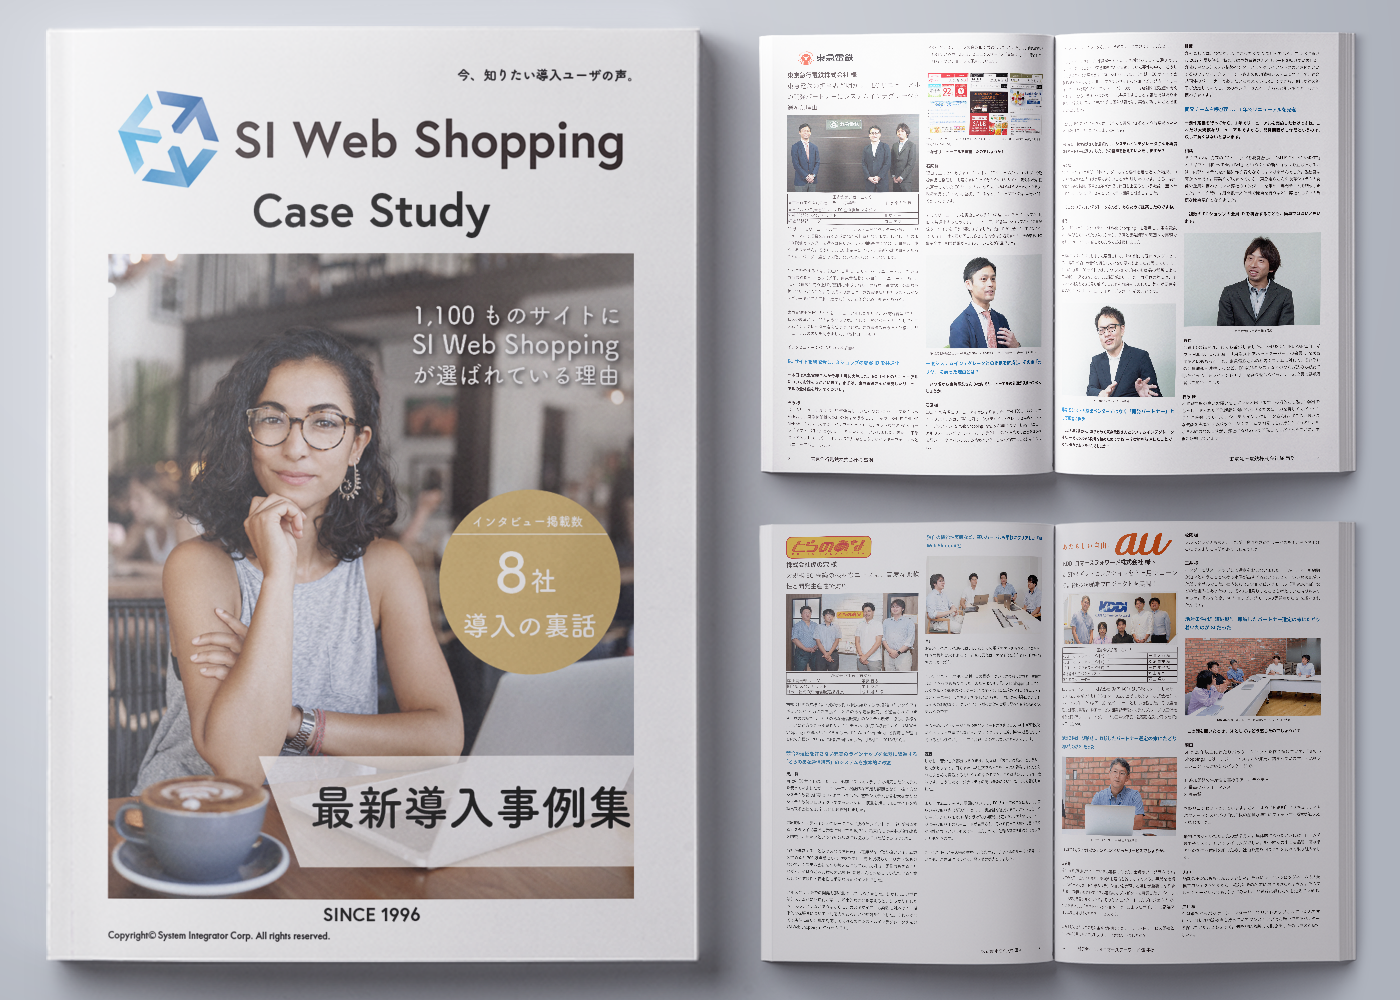 SI Web Shopping 導入事例集